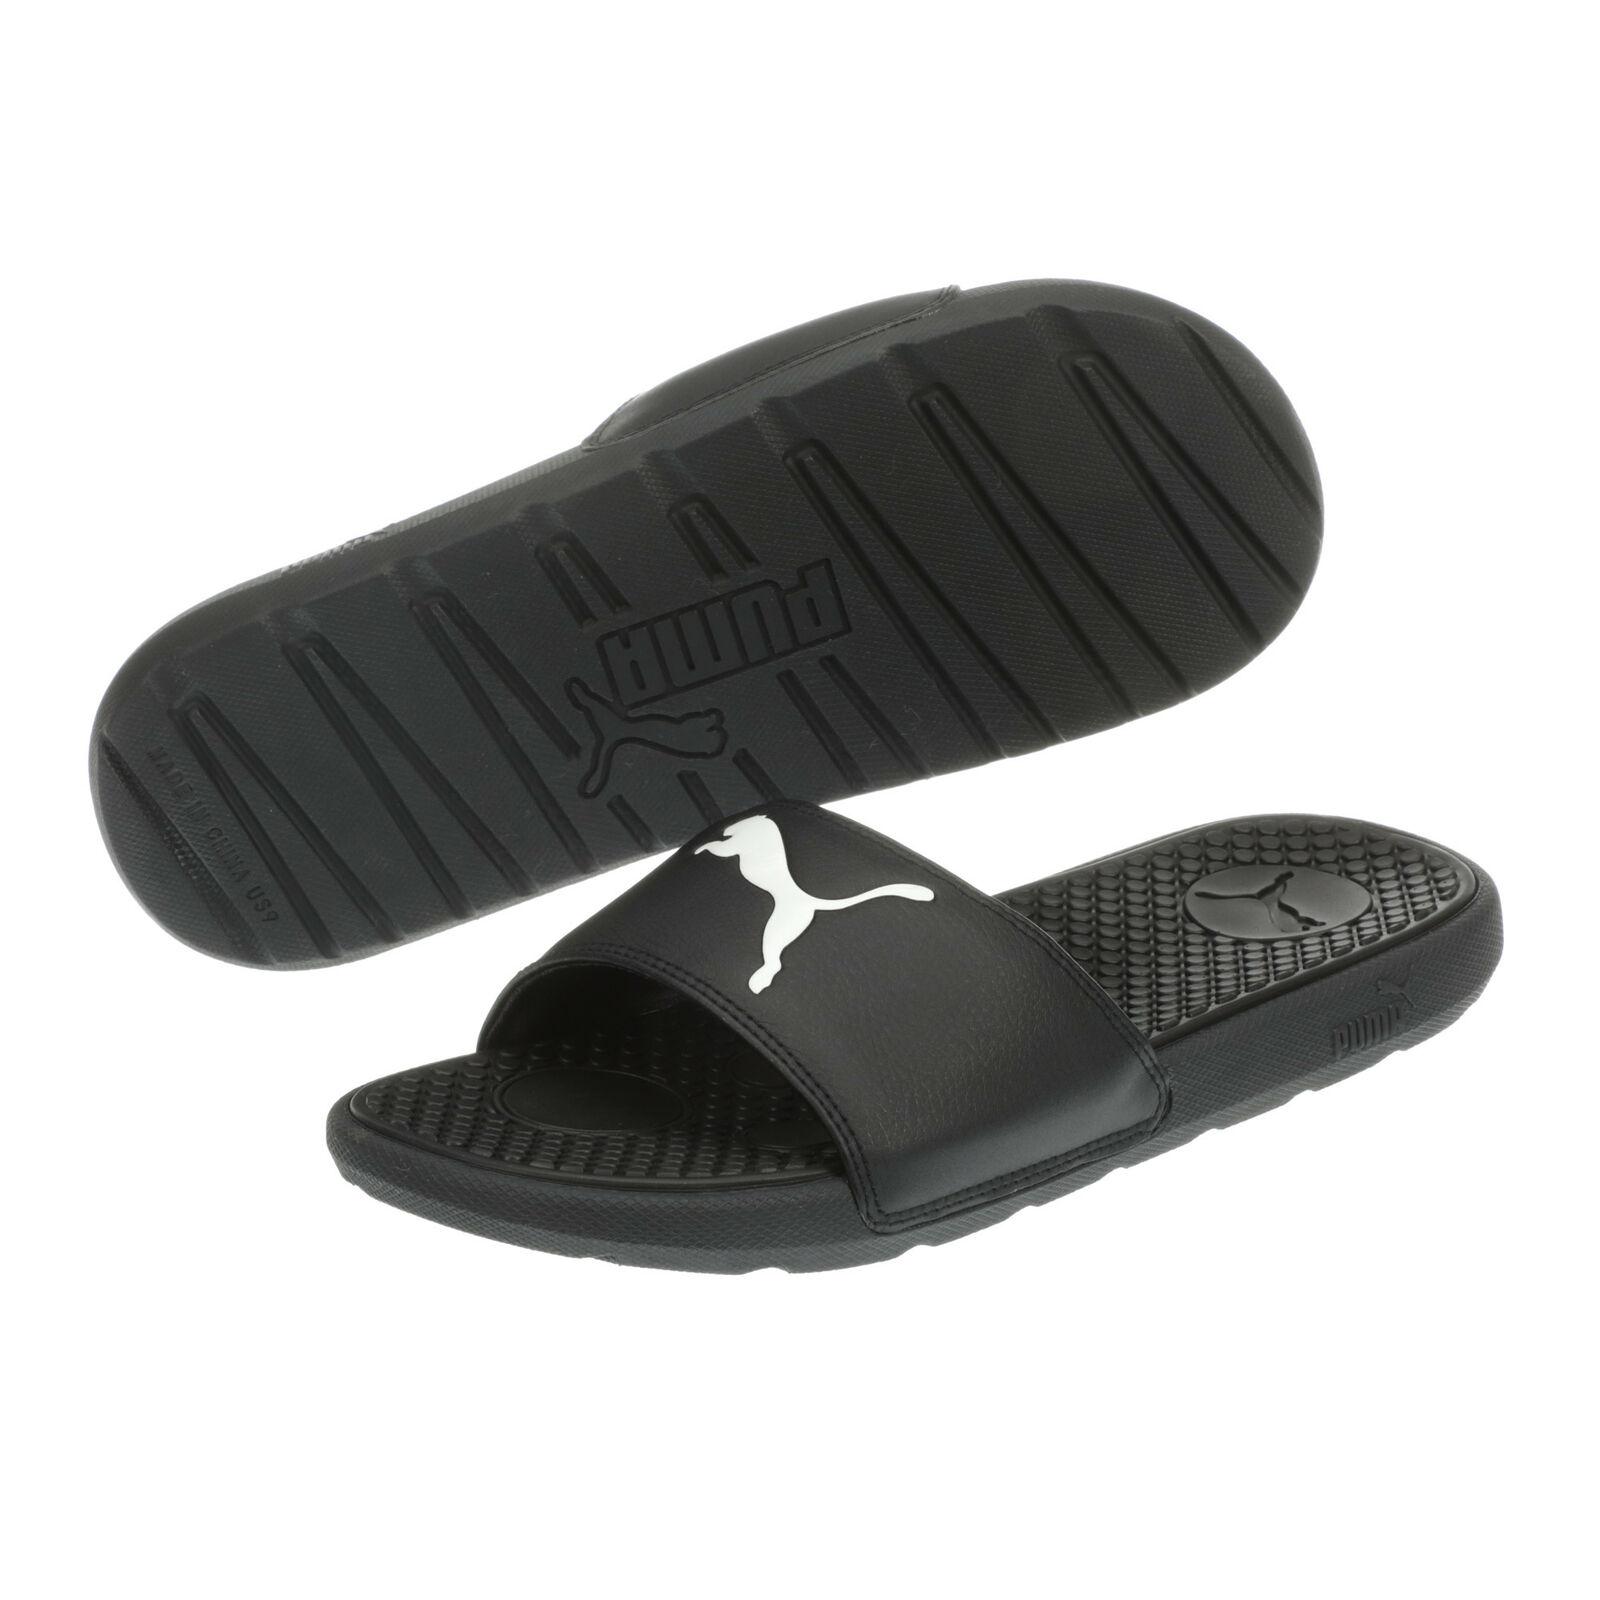 PUMA Women's Cool Cat Sport Slides Sandal (Black or Pink) $10 + free shipping